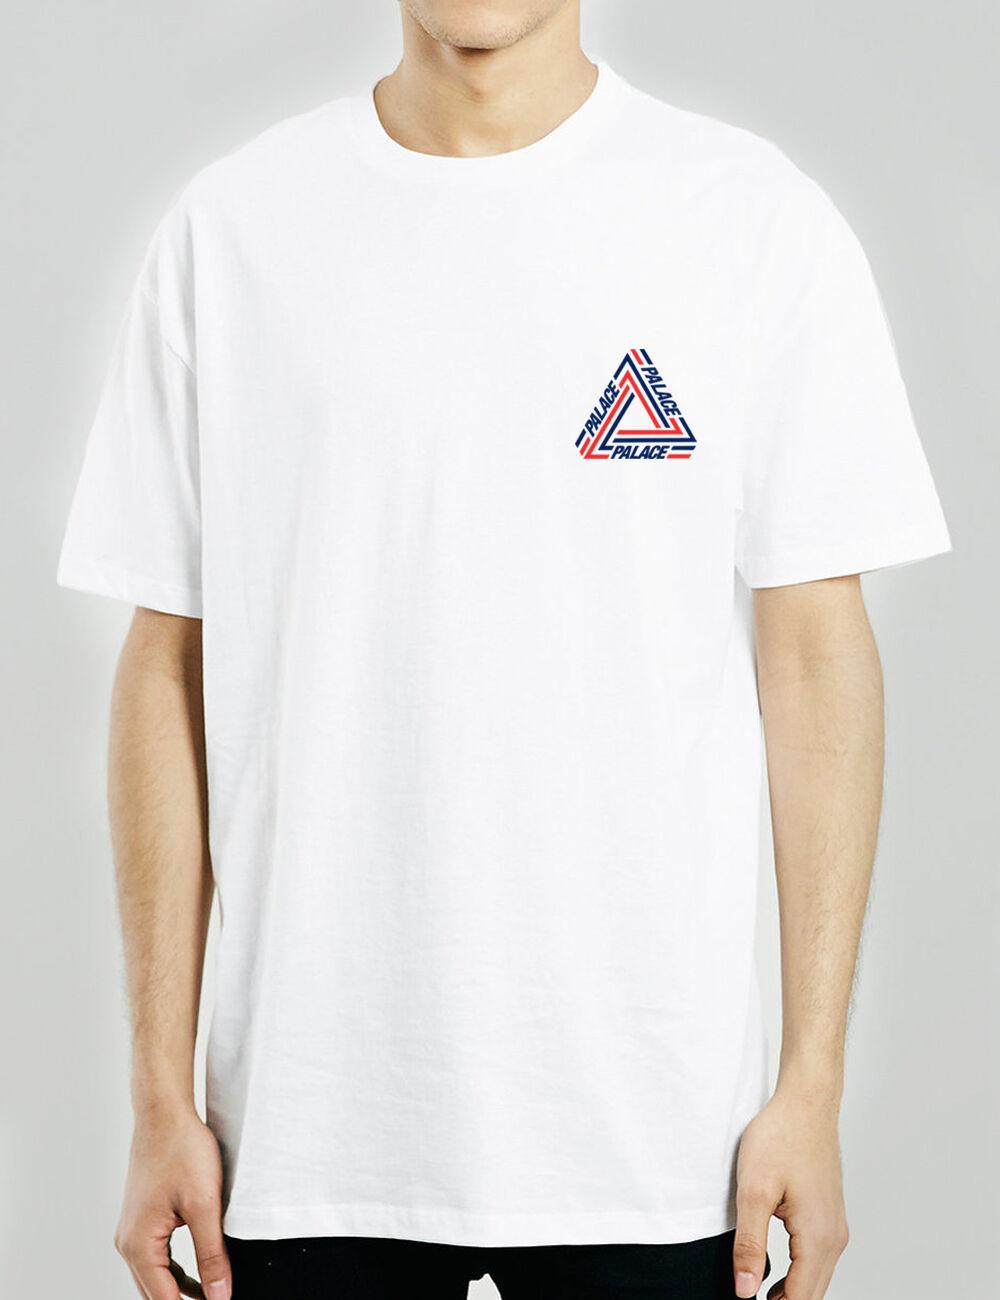 4f9f6444012d Palace Tri Crib White T Shirt  USA STOCK